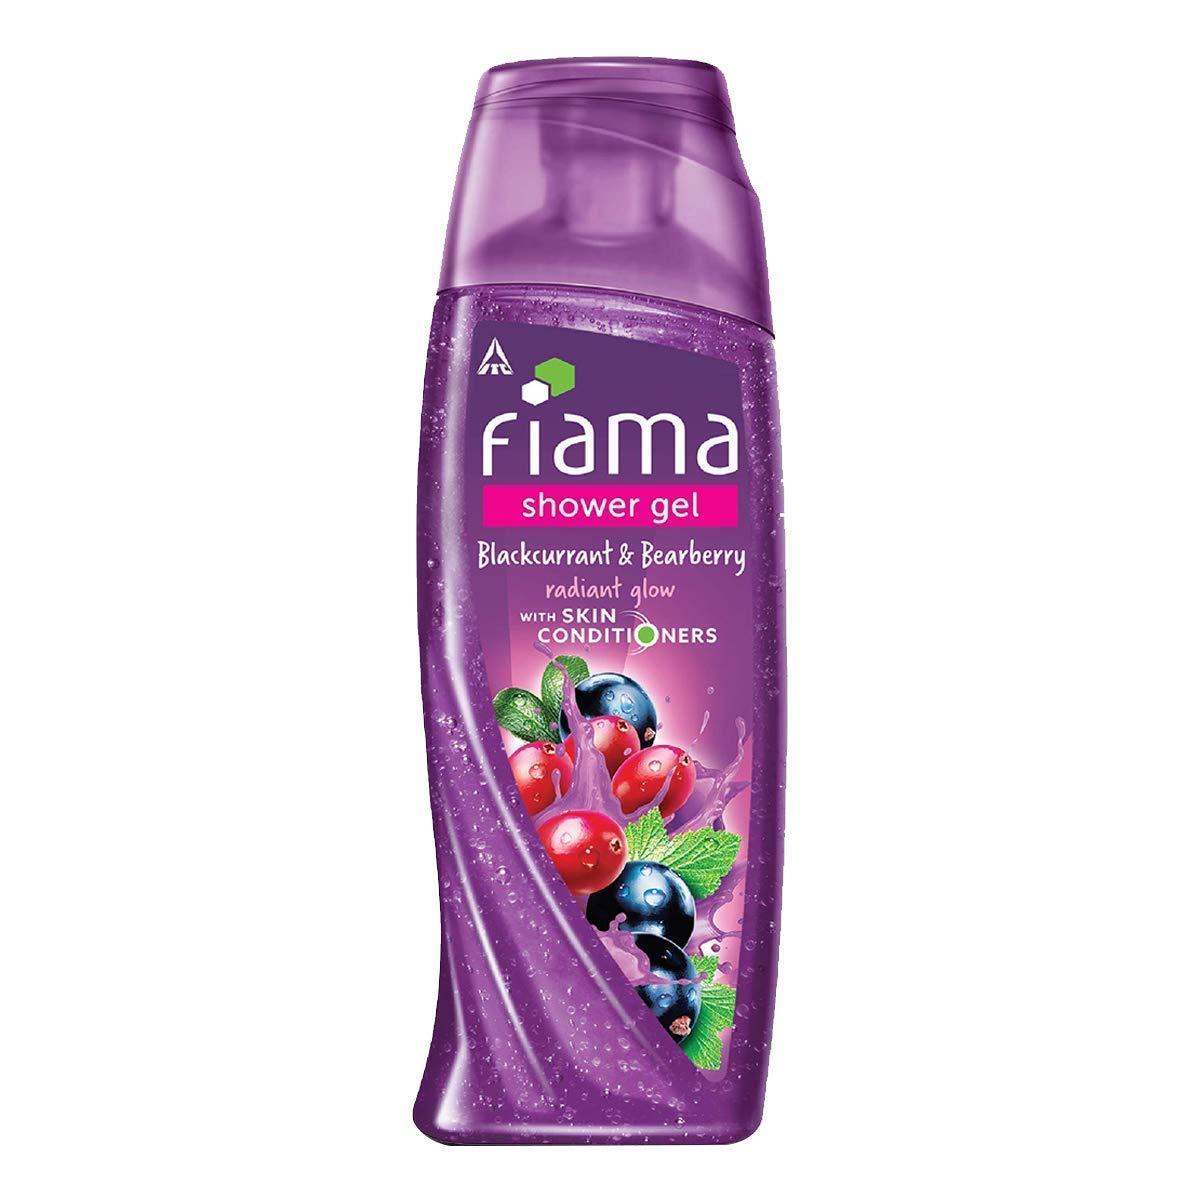 Fiama Blackcurrant & Bearberry, Shower Gel